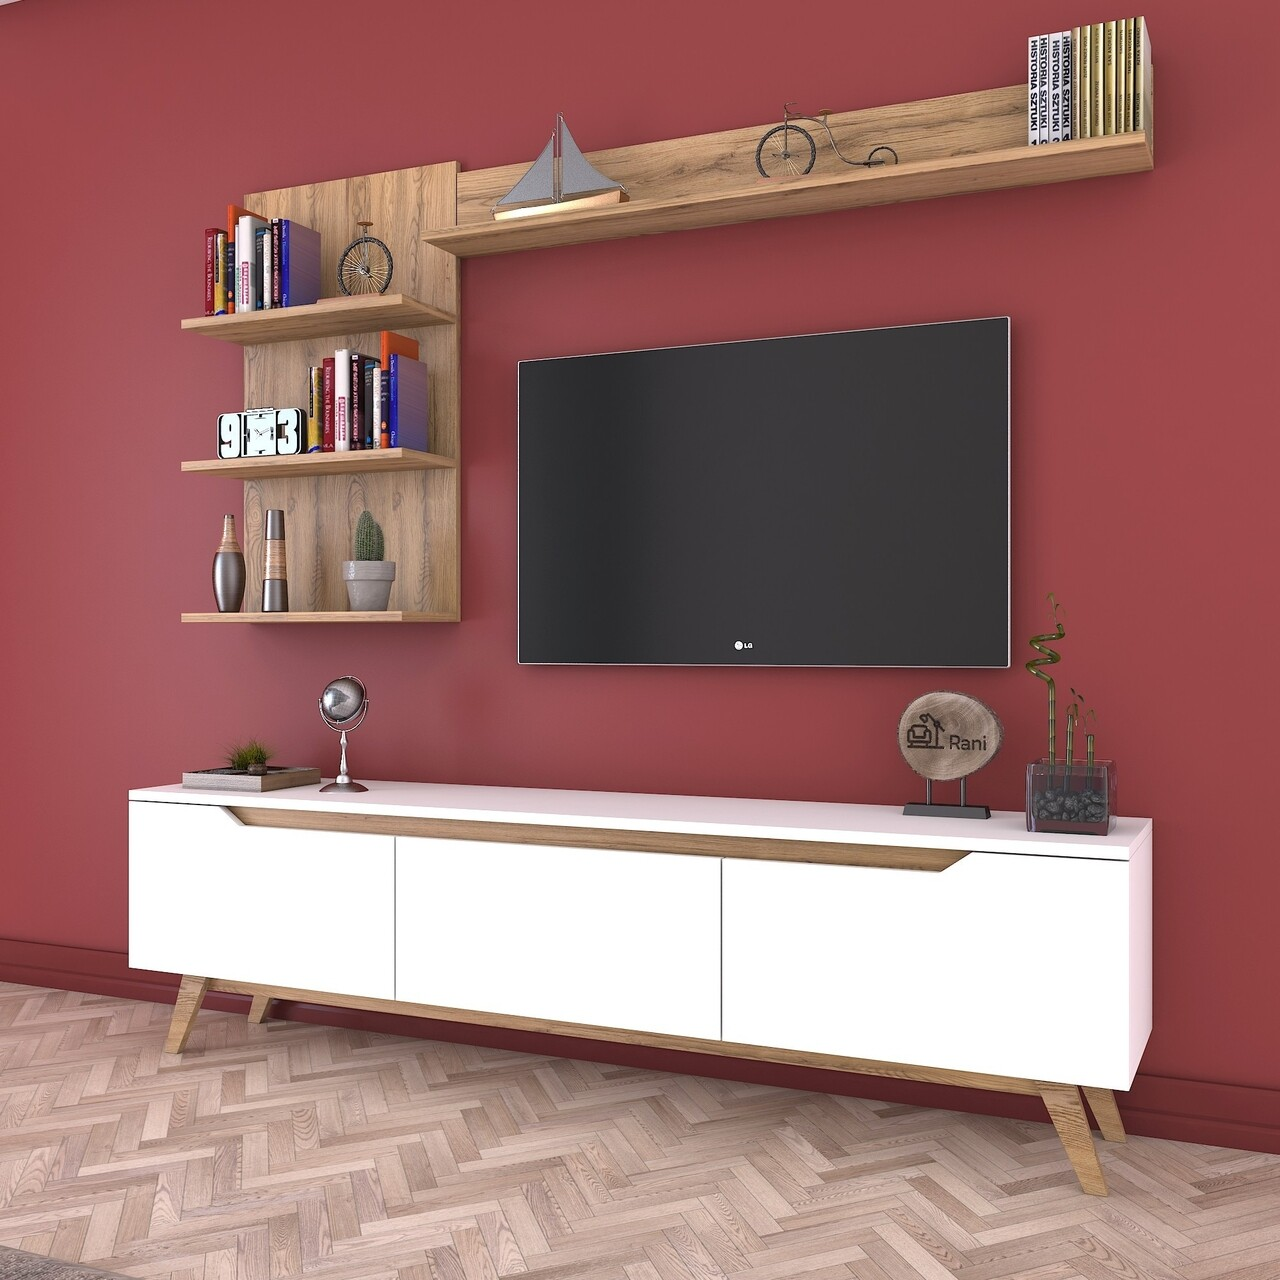 Comoda TV cu 3 rafturi de perete M41 - 423, Wren, 180 x 35 x 48.6 cm/90 cm/133 cm, white/walnut